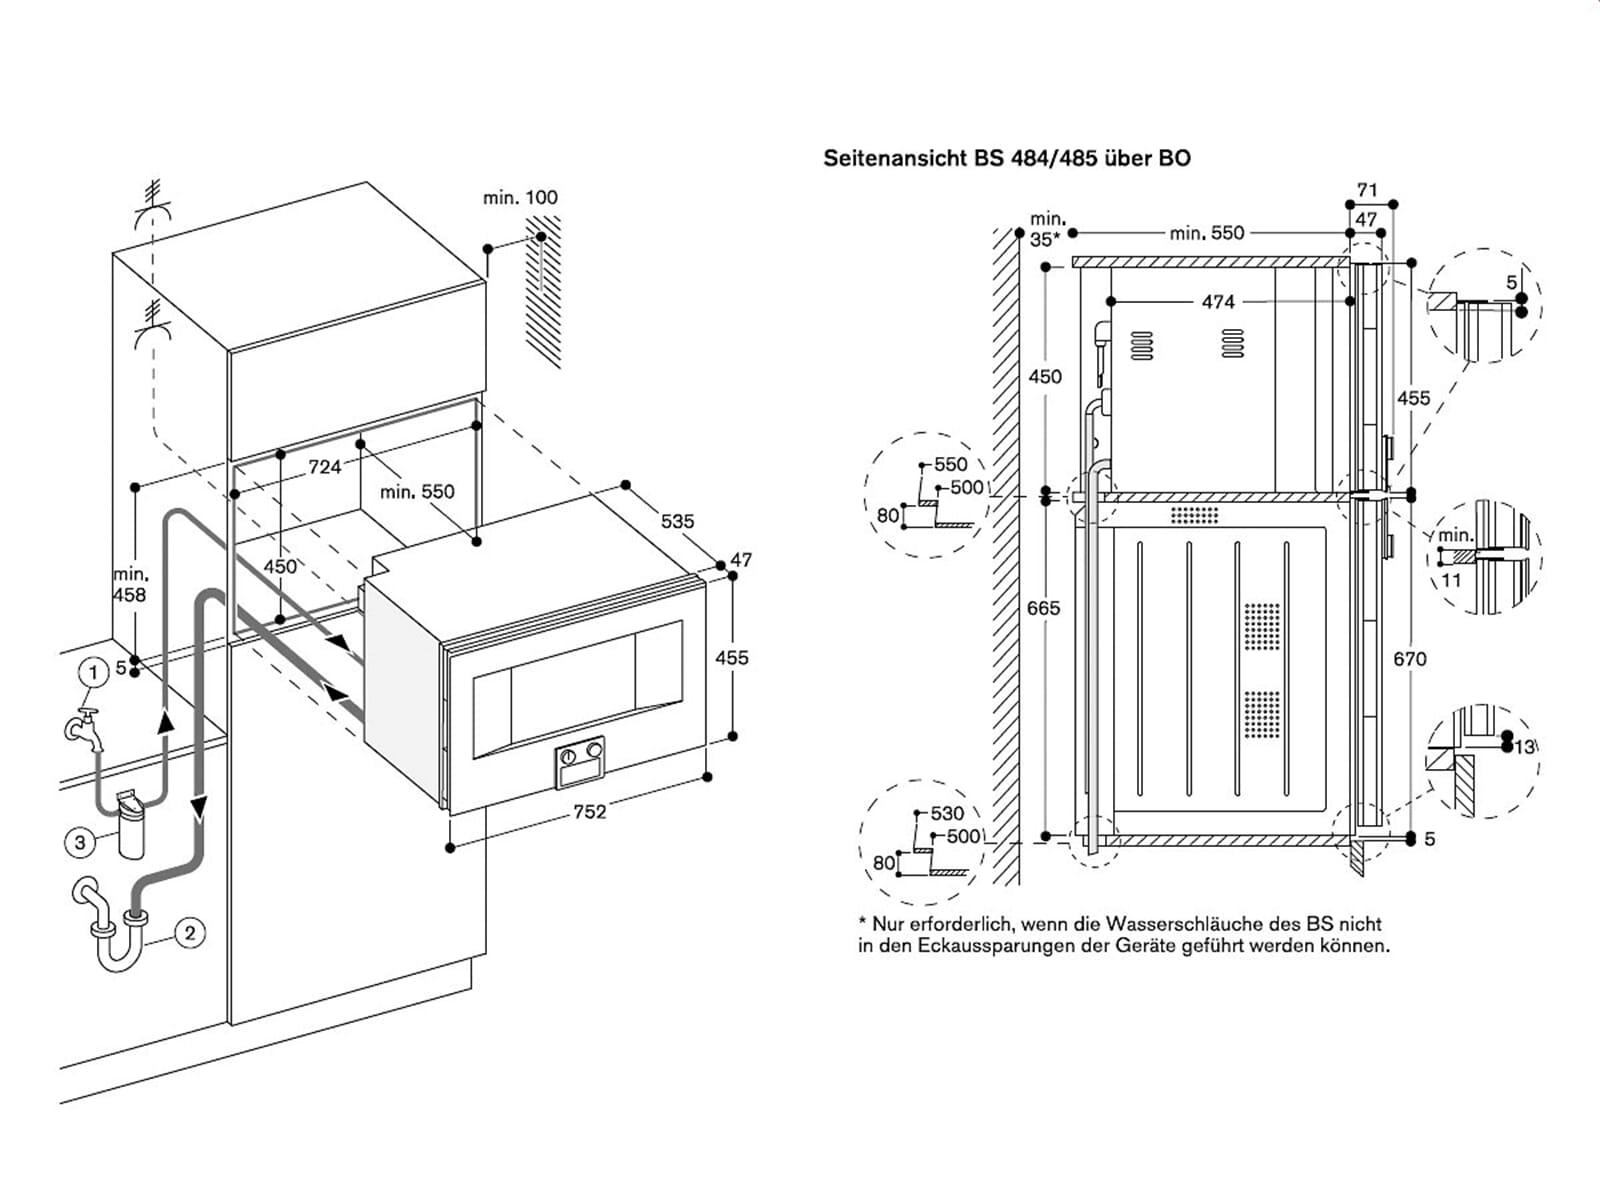 Gaggenau BS 484 111 Kompakt Dampfbackofen Serie 400 Edelstahl/Glas